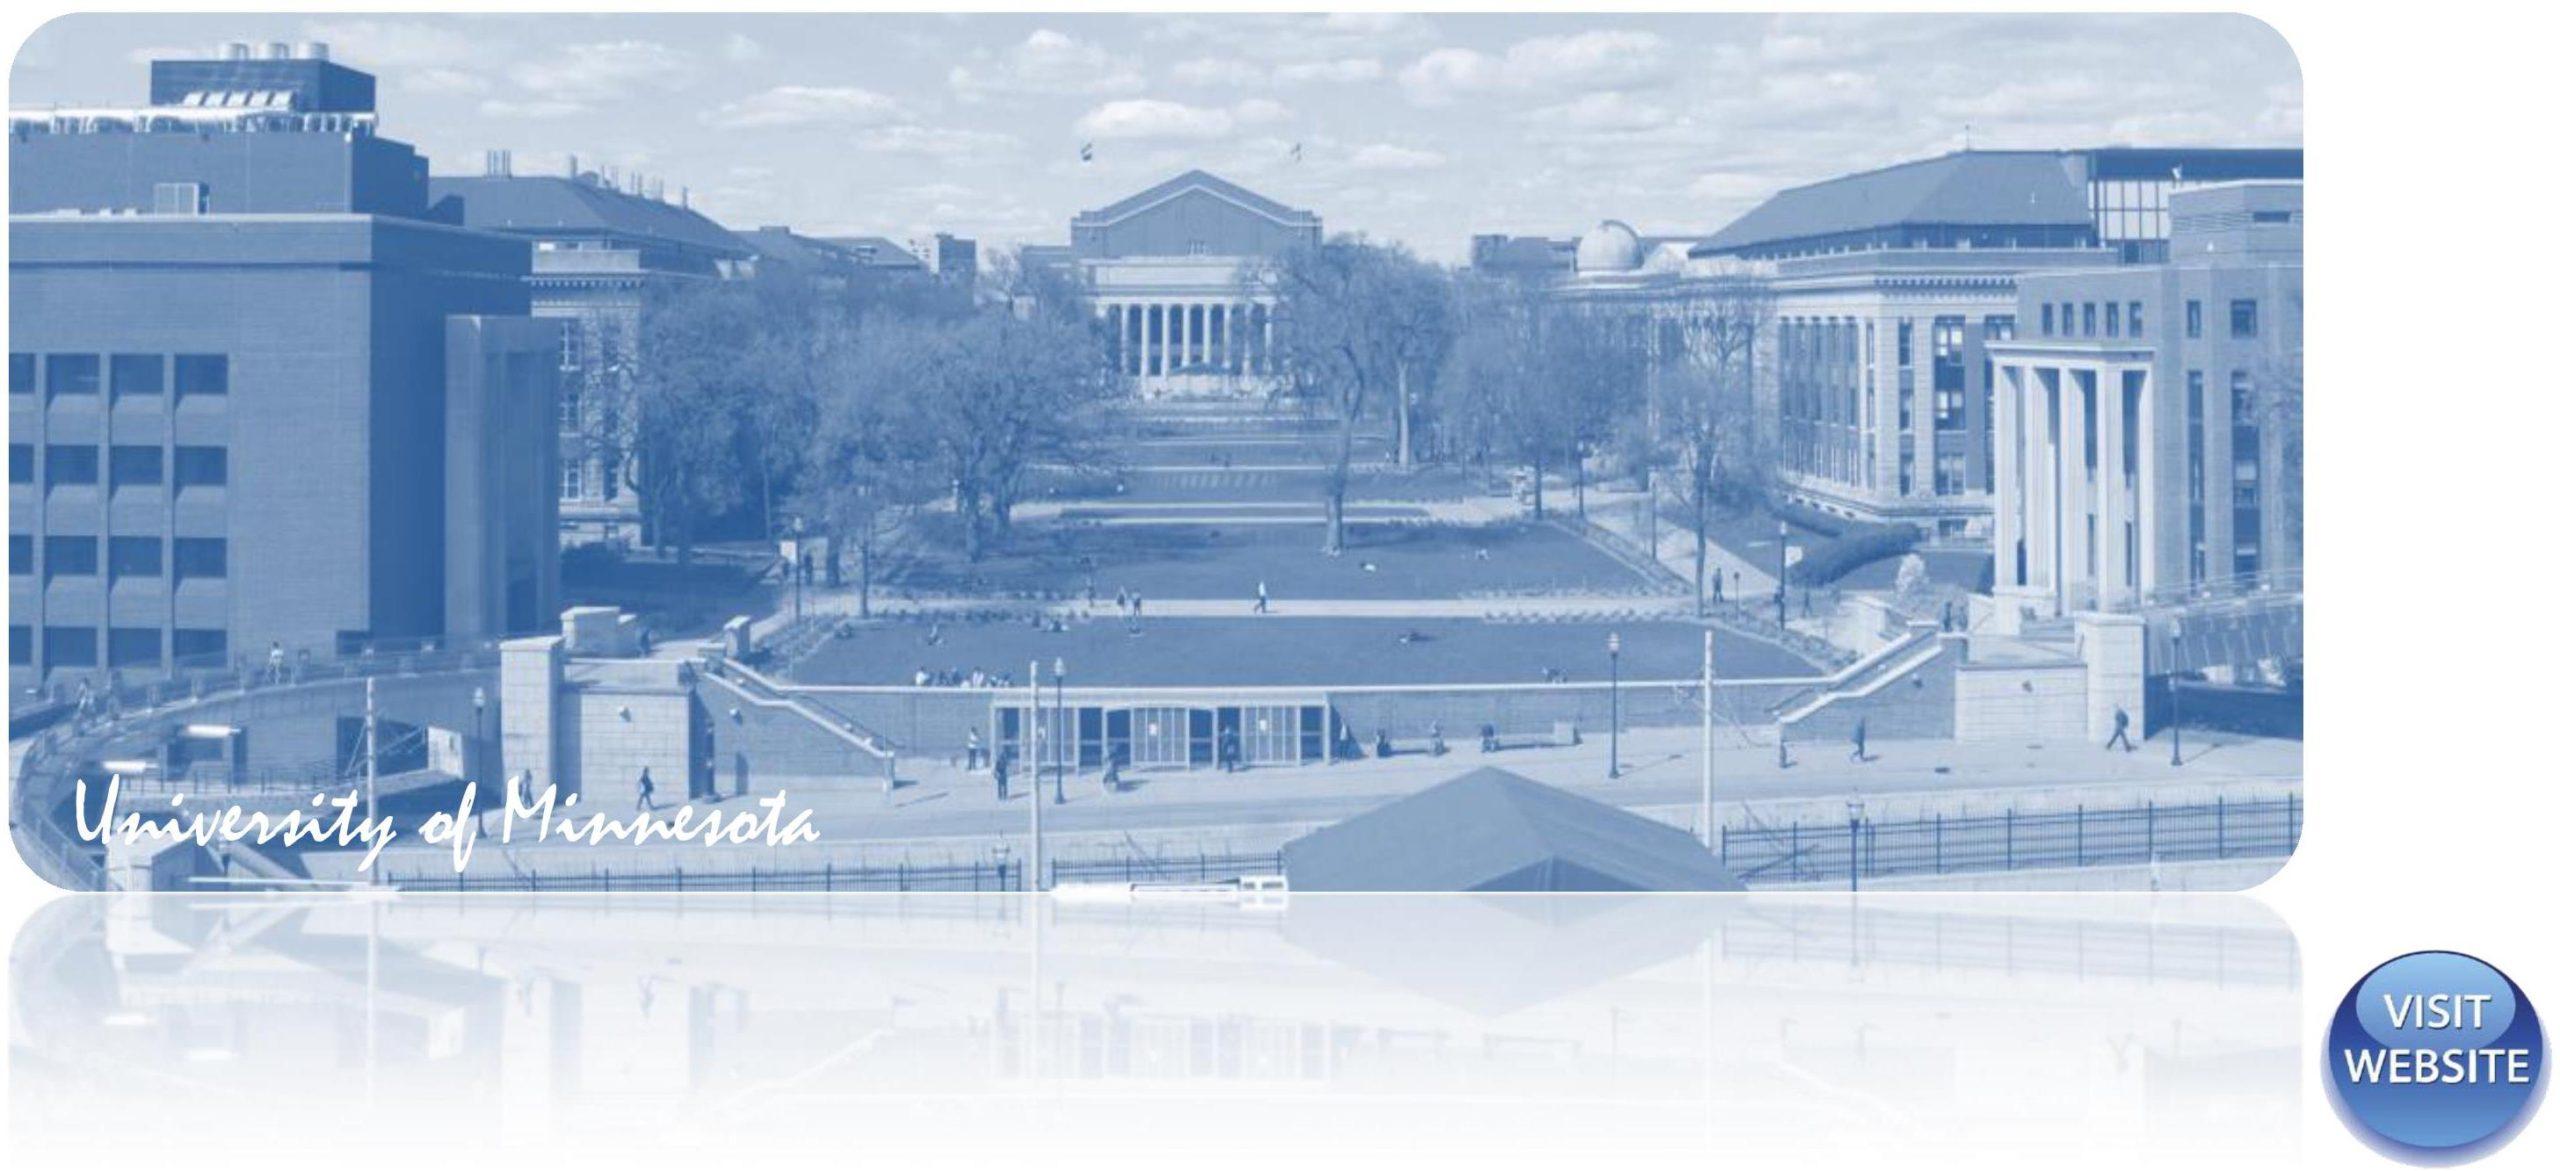 University of Minnesota USA